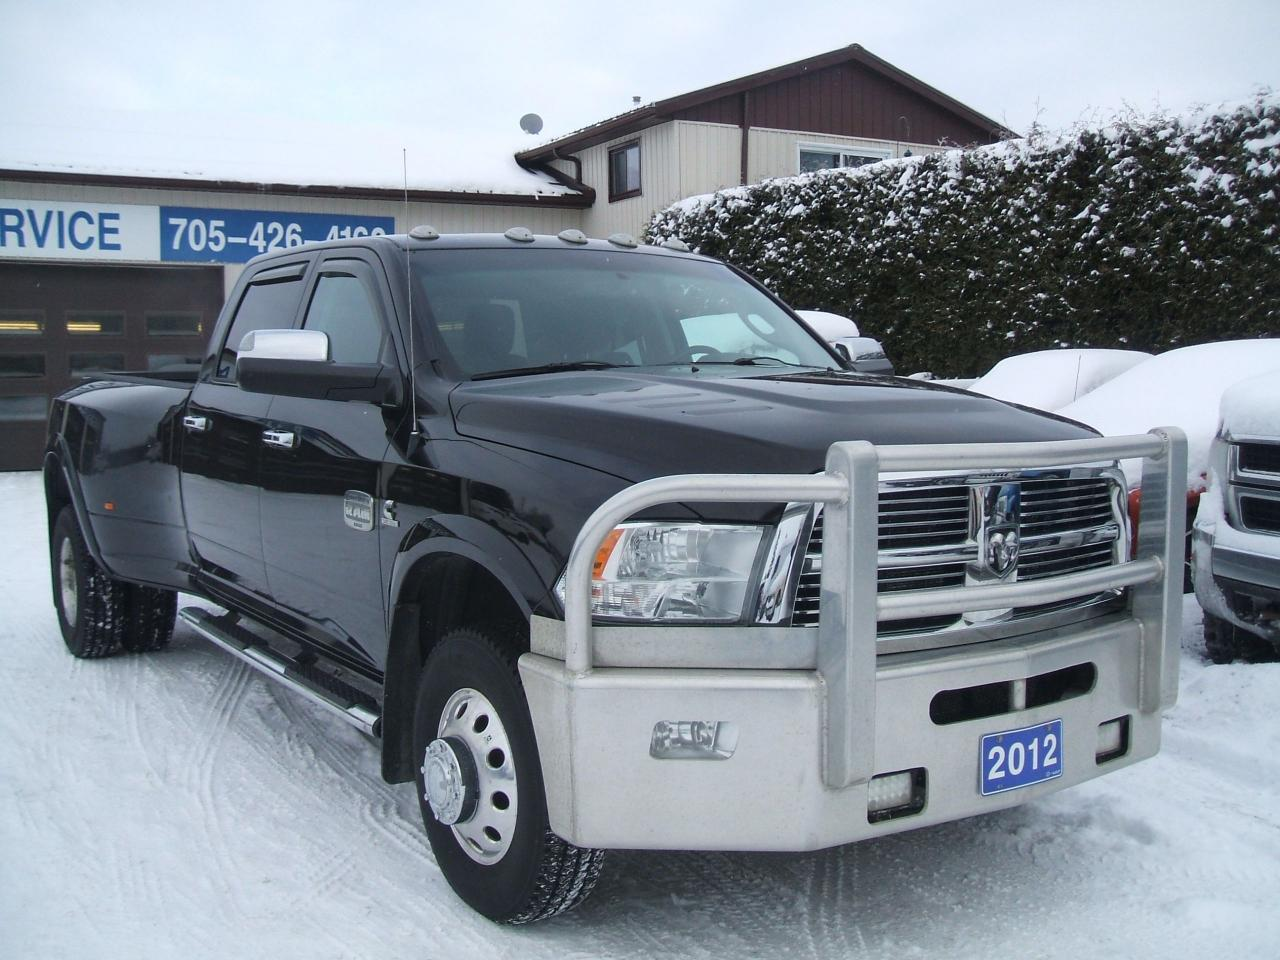 Photo of Black 2012 Dodge Ram 3500